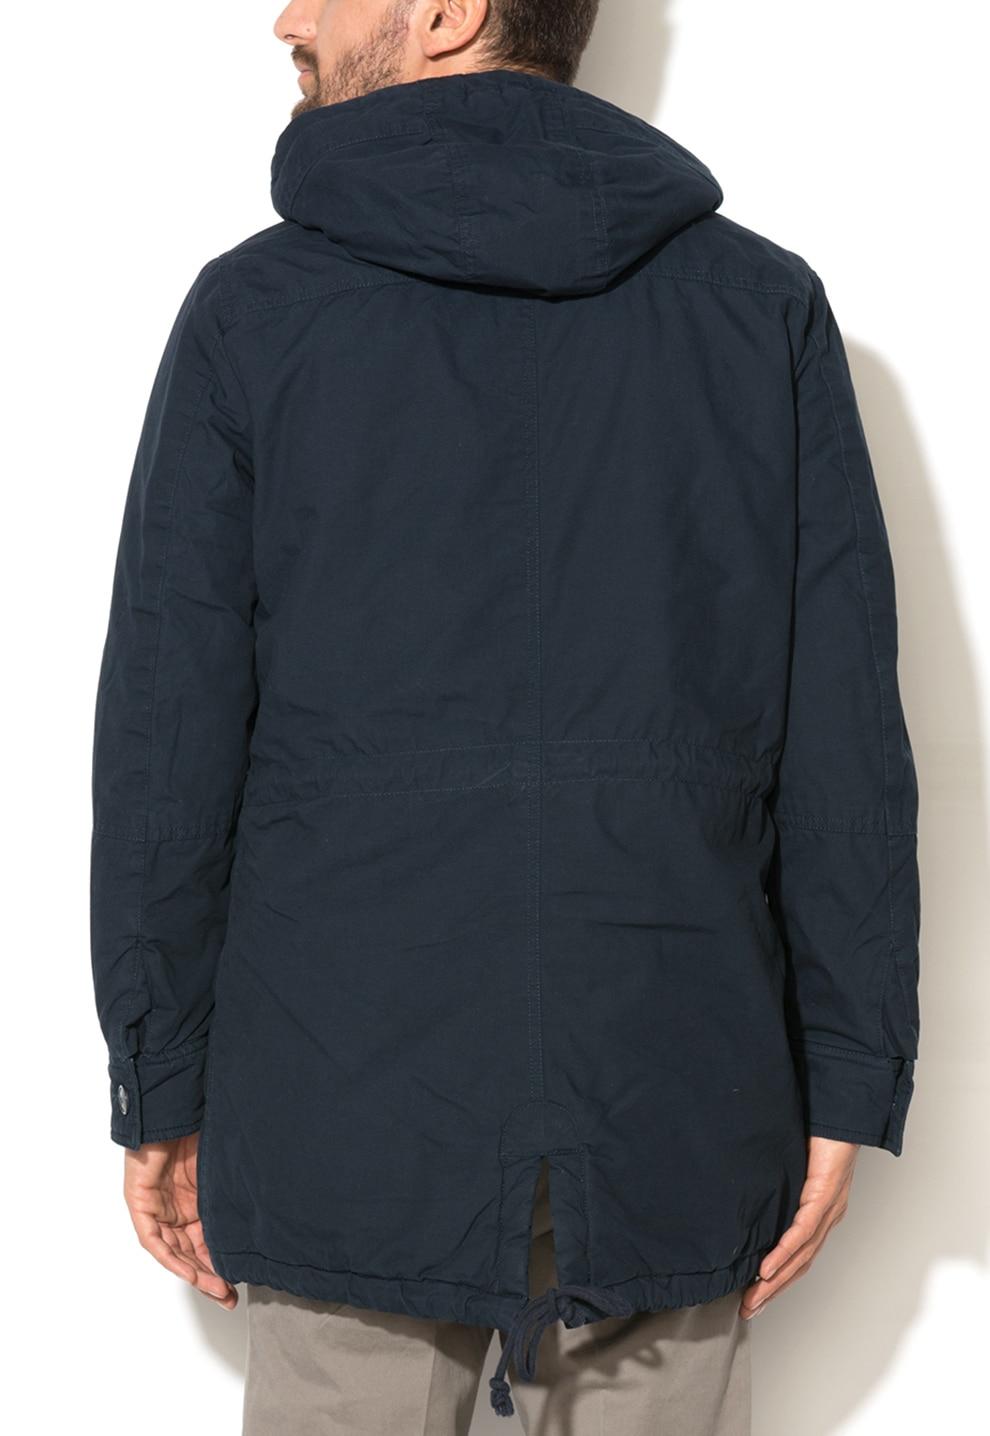 Normál fazonú kapucnis dzseki United Colors of Benetton